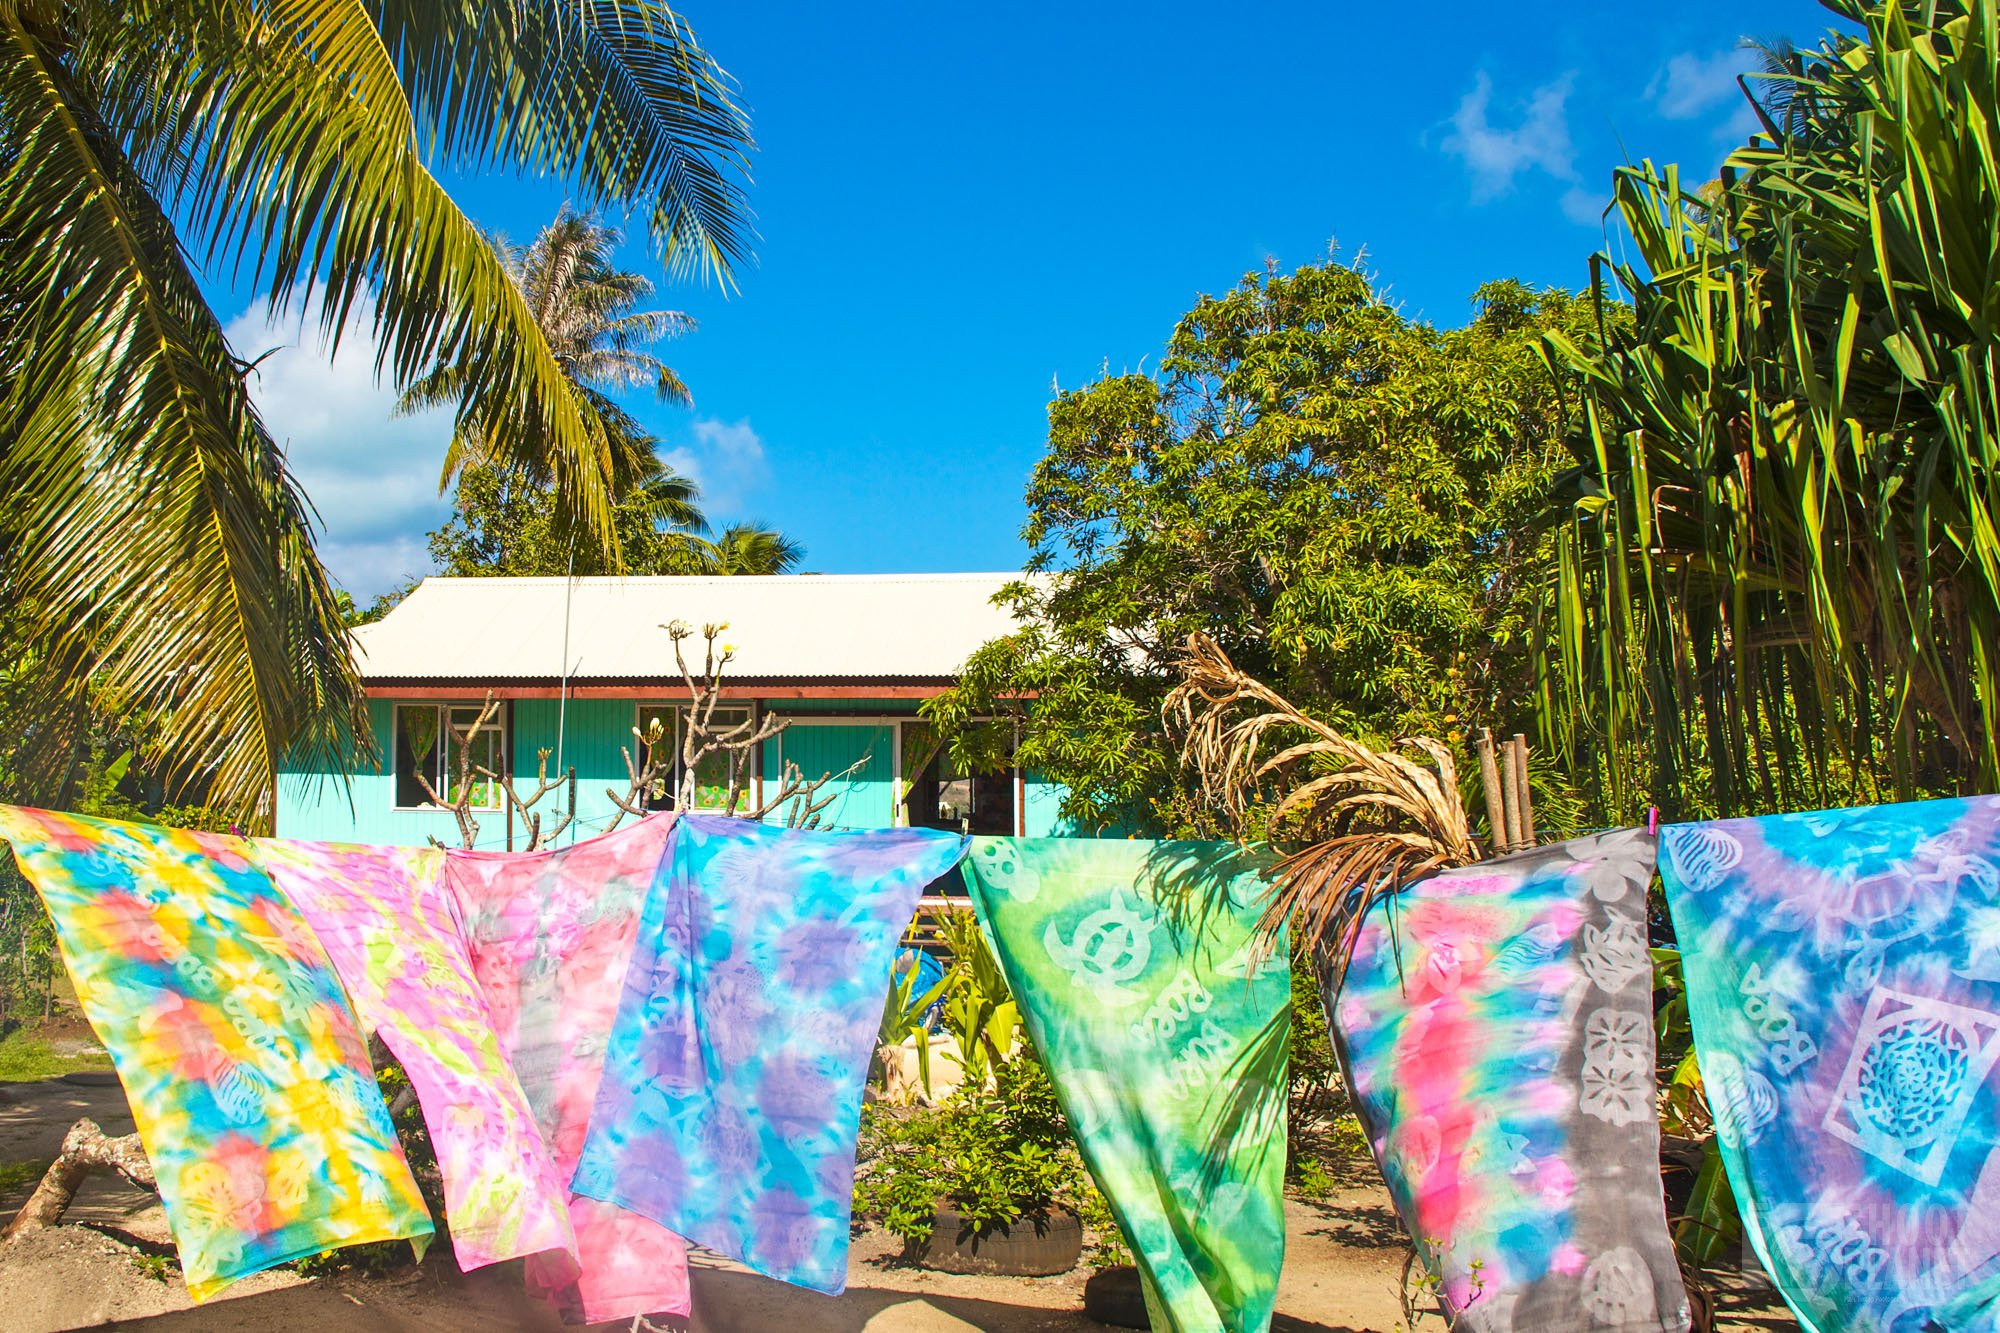 Tahitian shawls blowing in Bora Bora wind